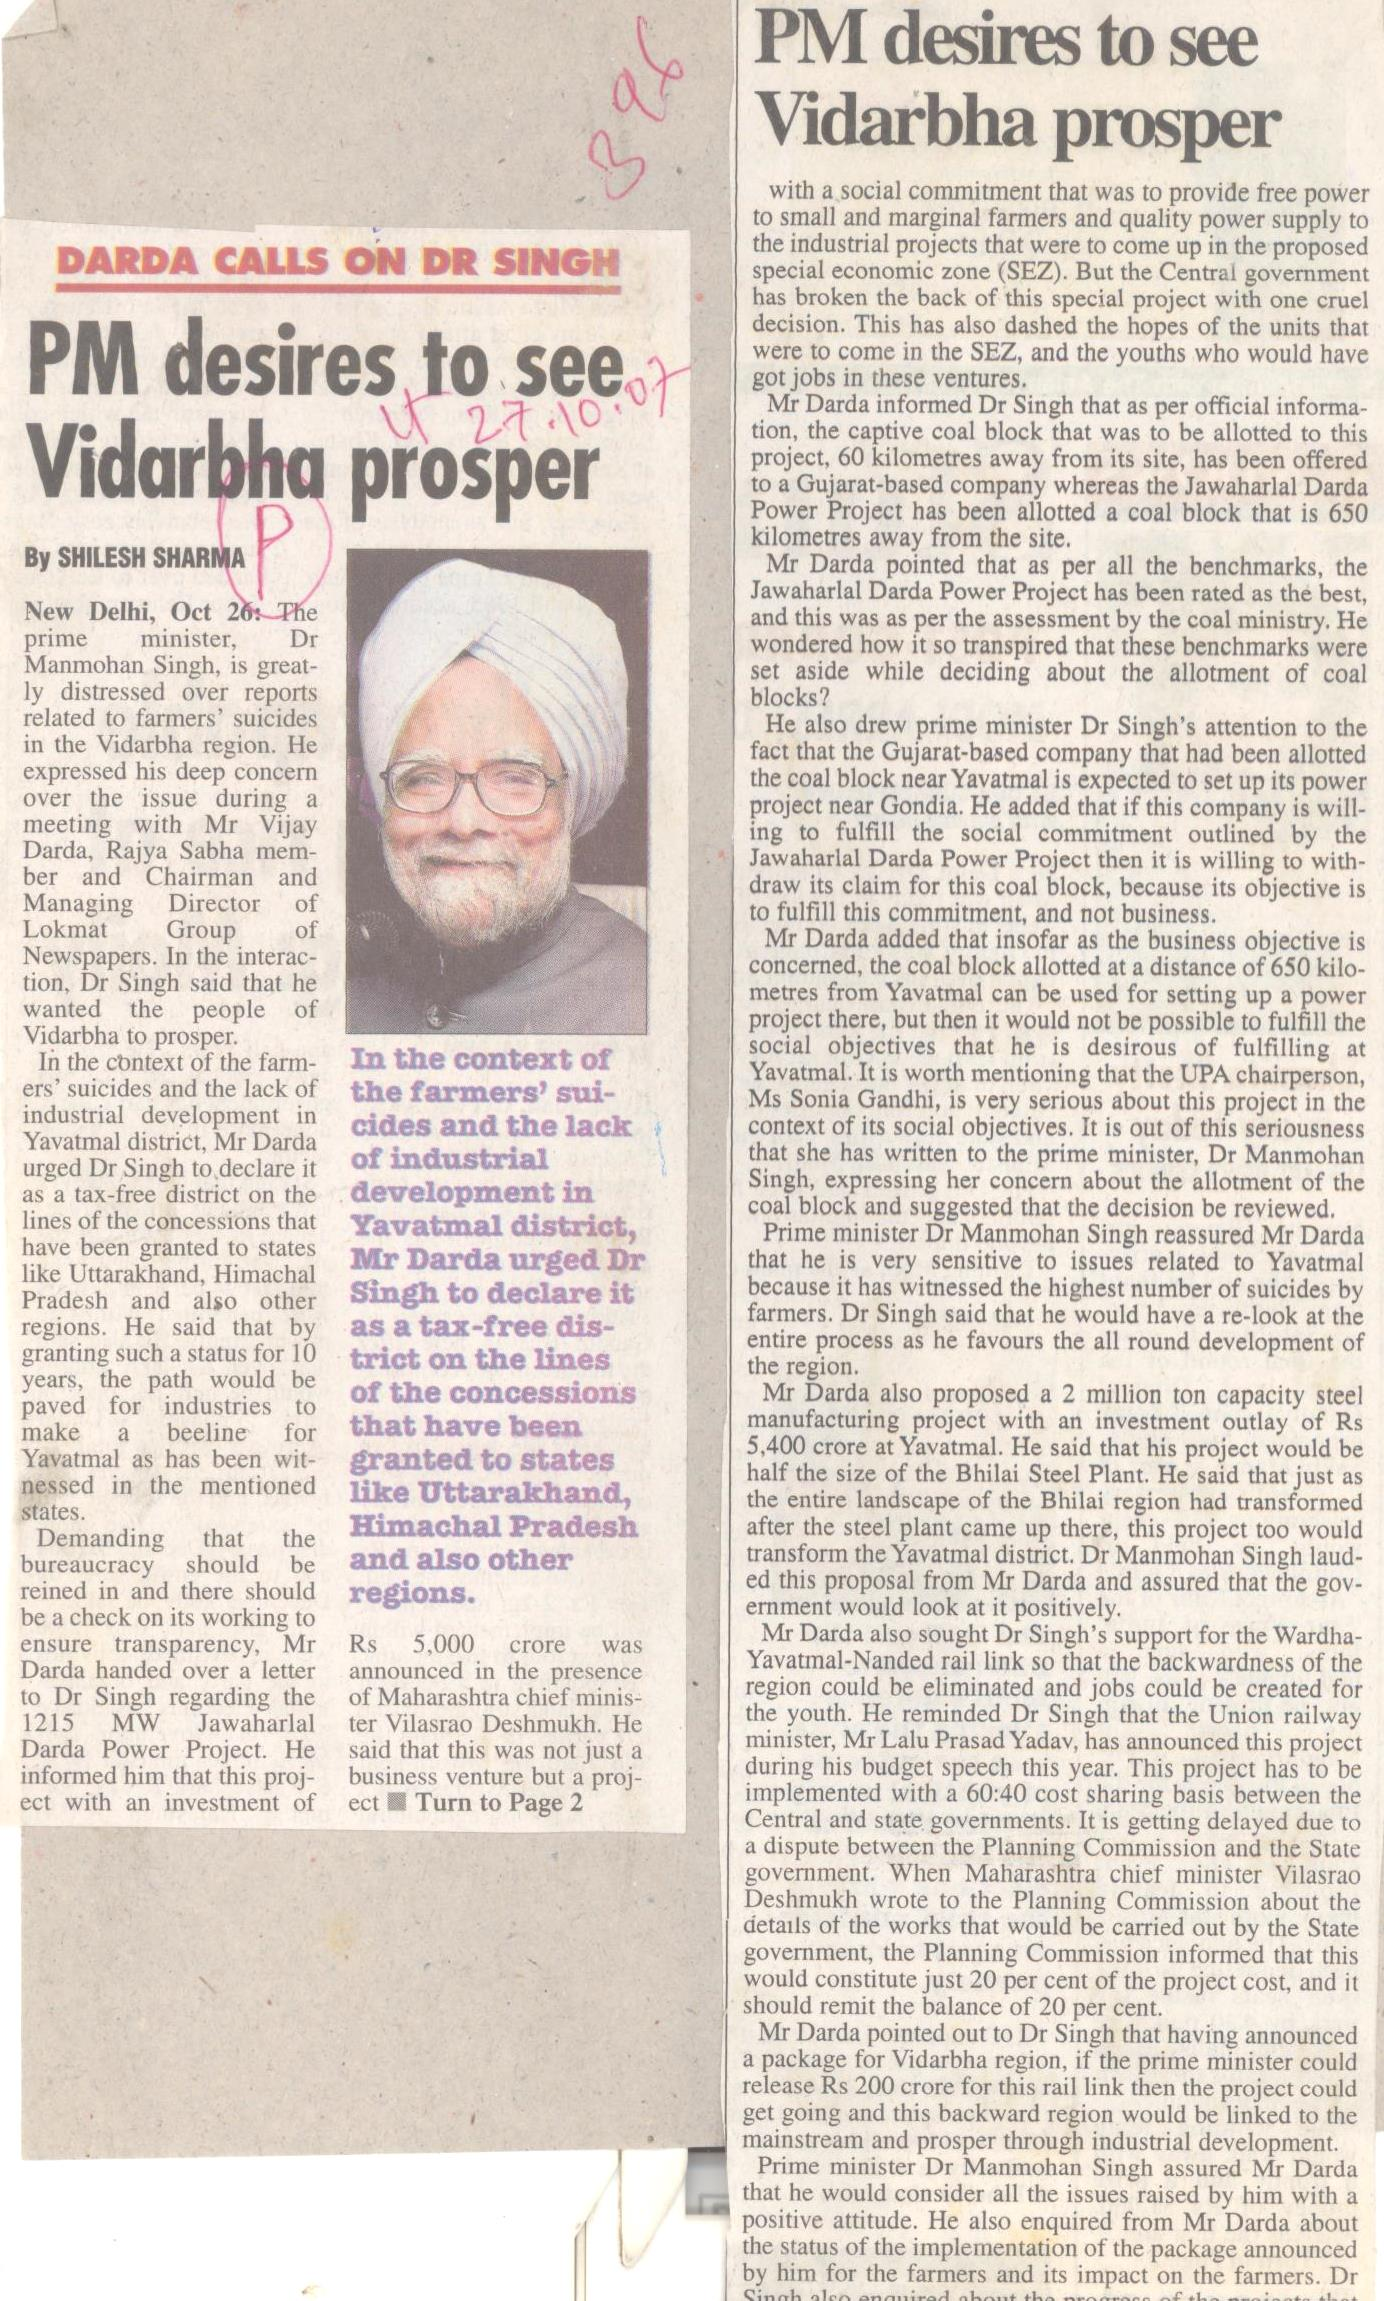 PM desires to see Vidarbha prosper